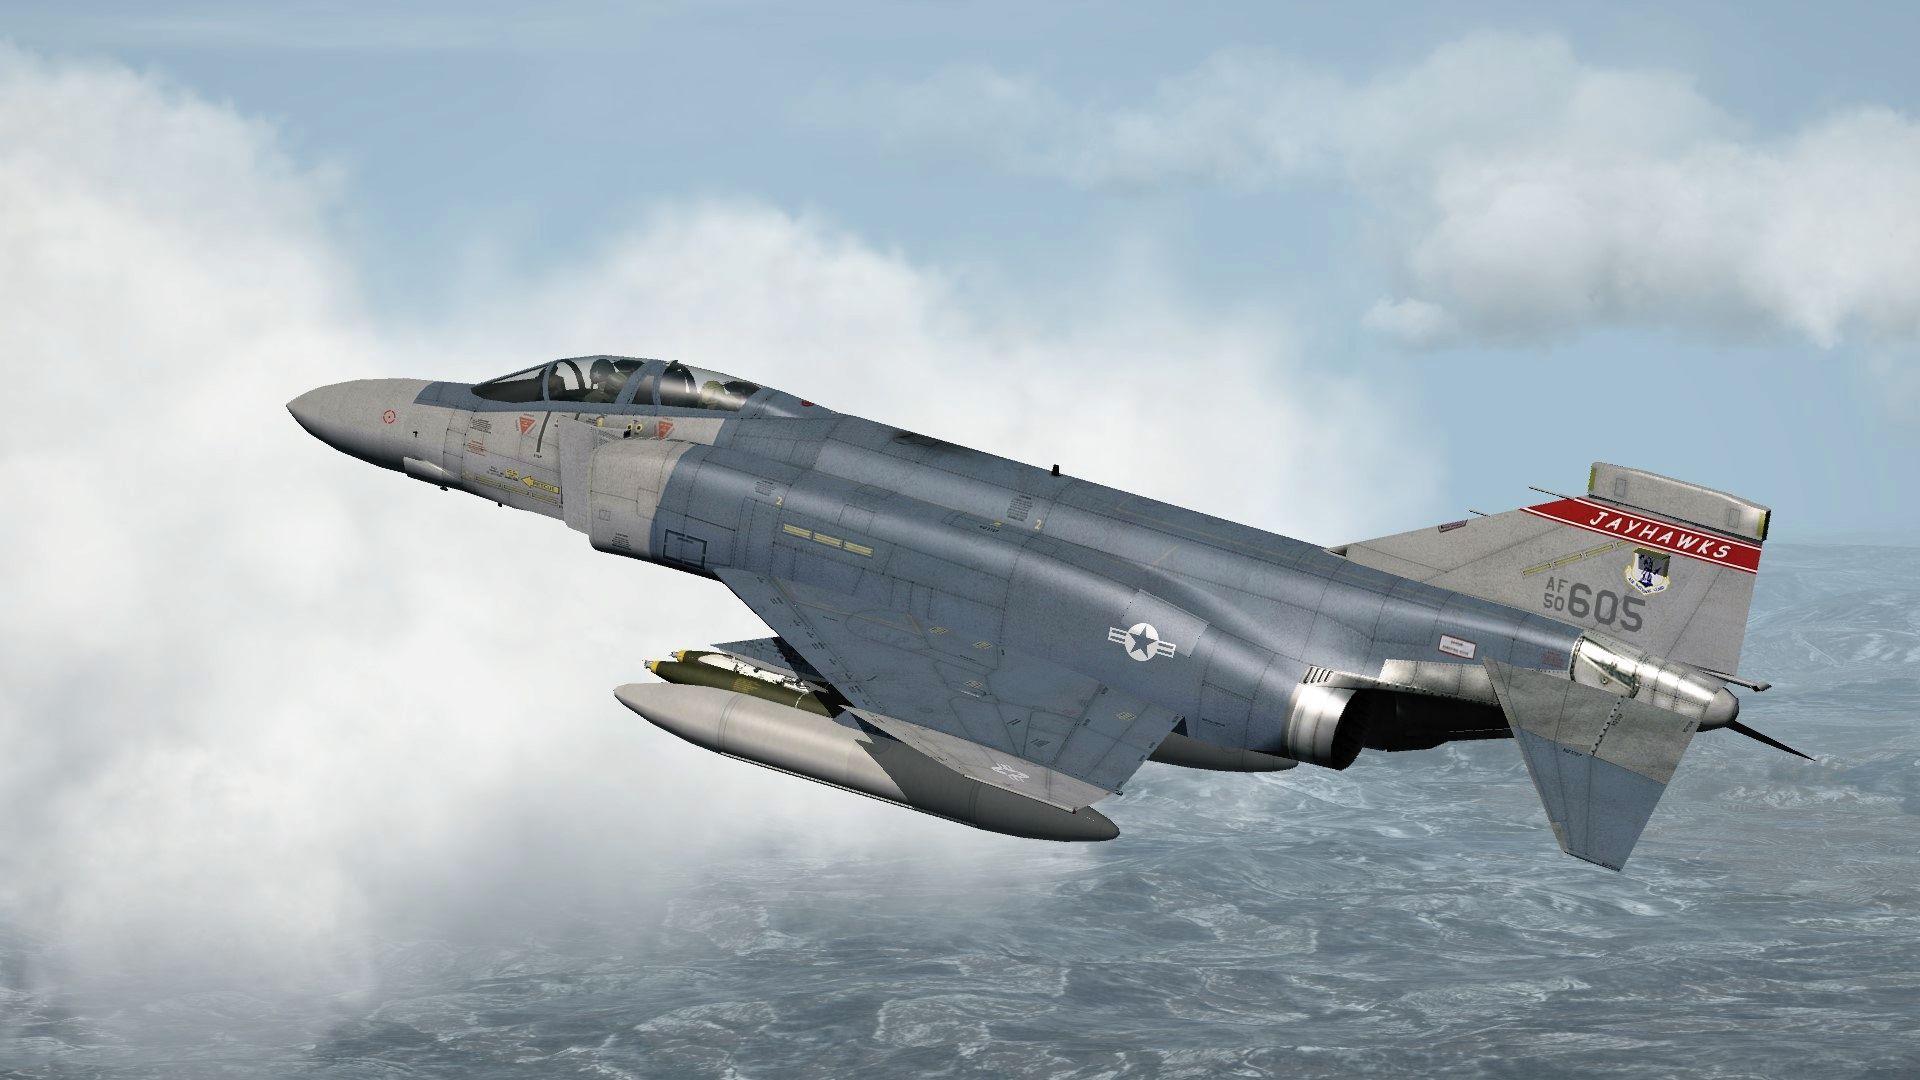 USAF%20F-4M%20PHANTOM.27_zpsm5wguhrw.jpg